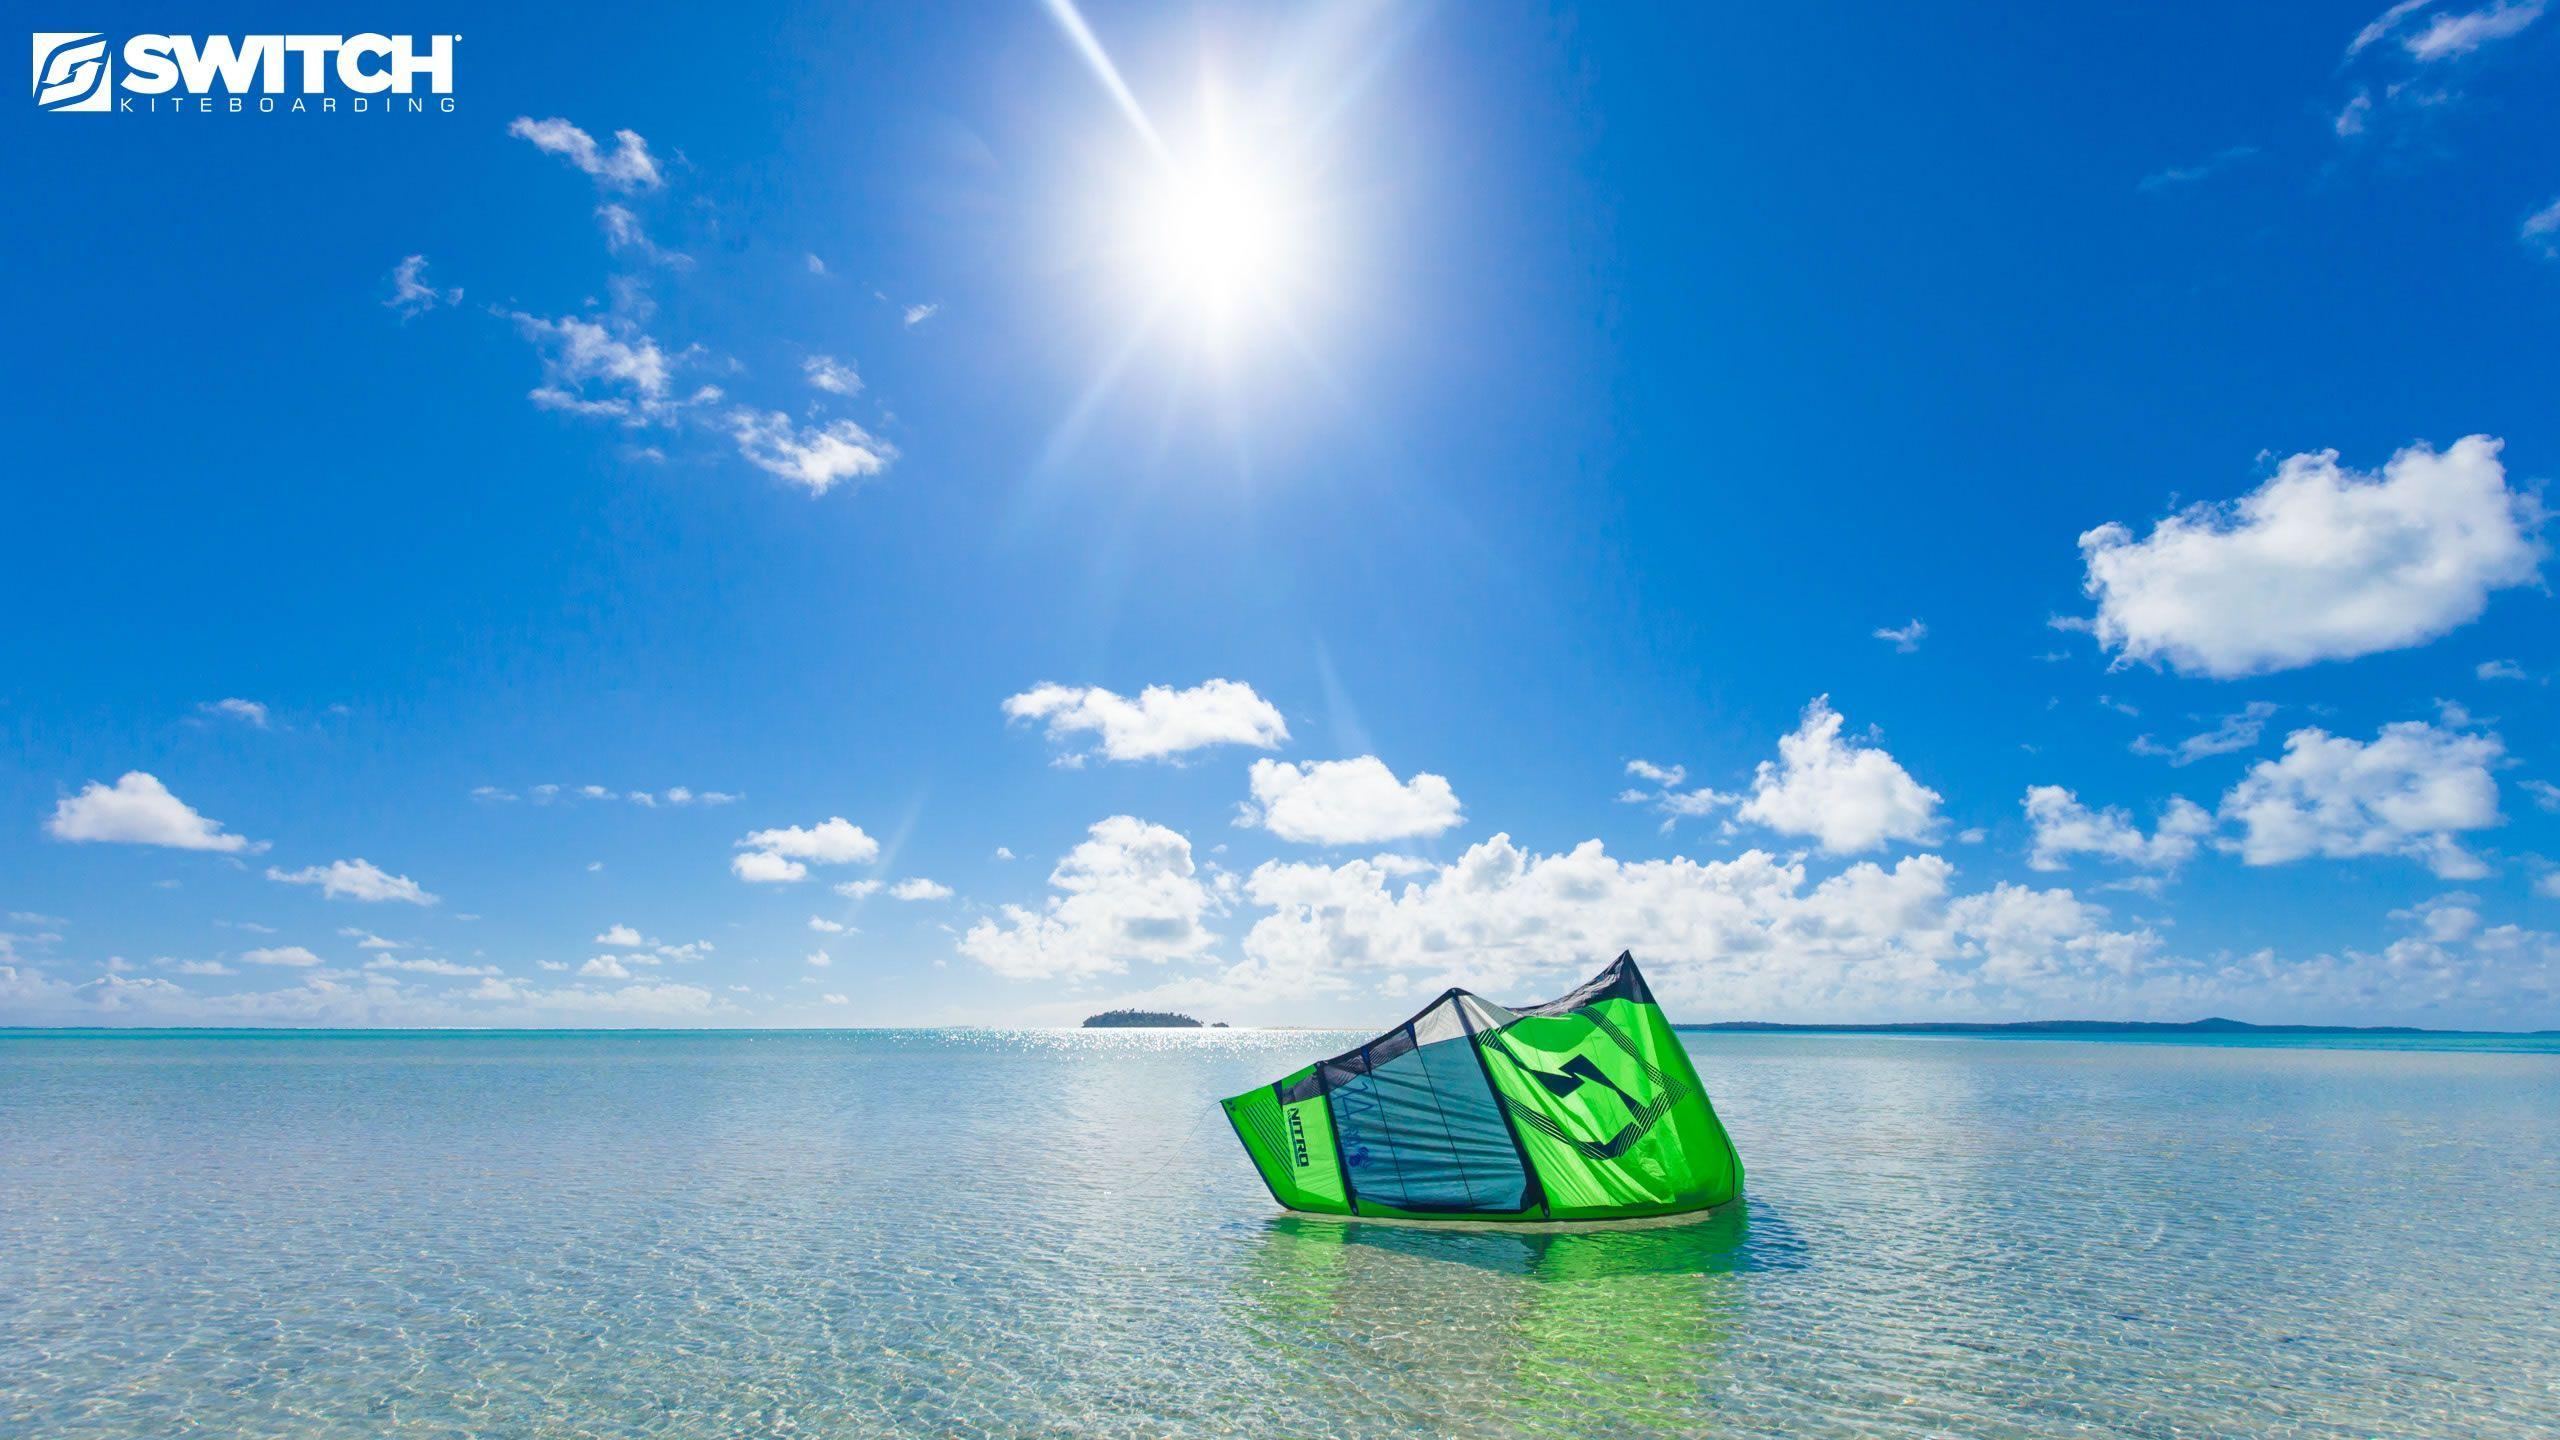 Kiteboarding Wallpaper: Tuvalu Wallpapers